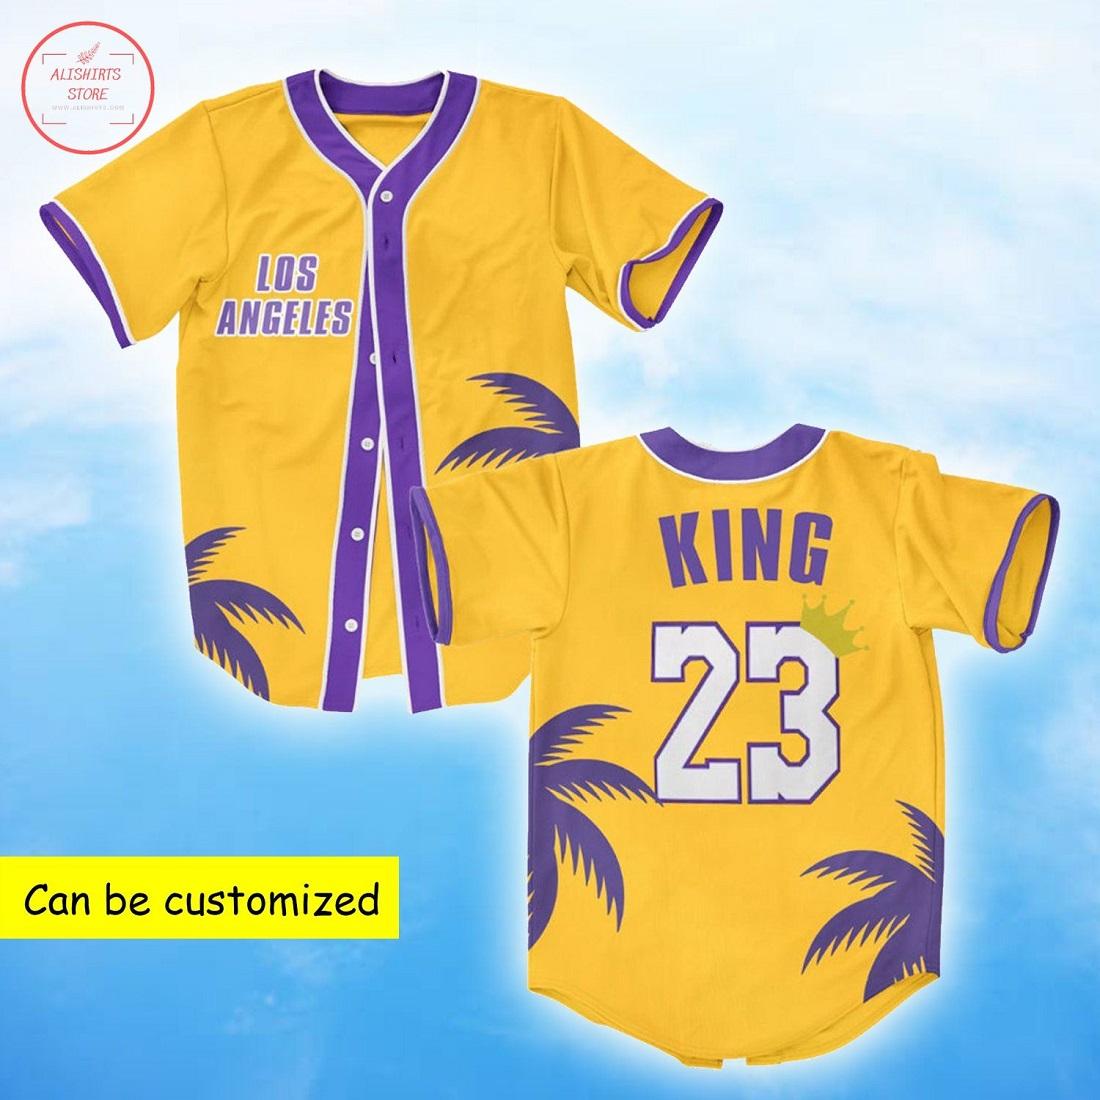 King 23 Of Los Angeles Baseball Jersey